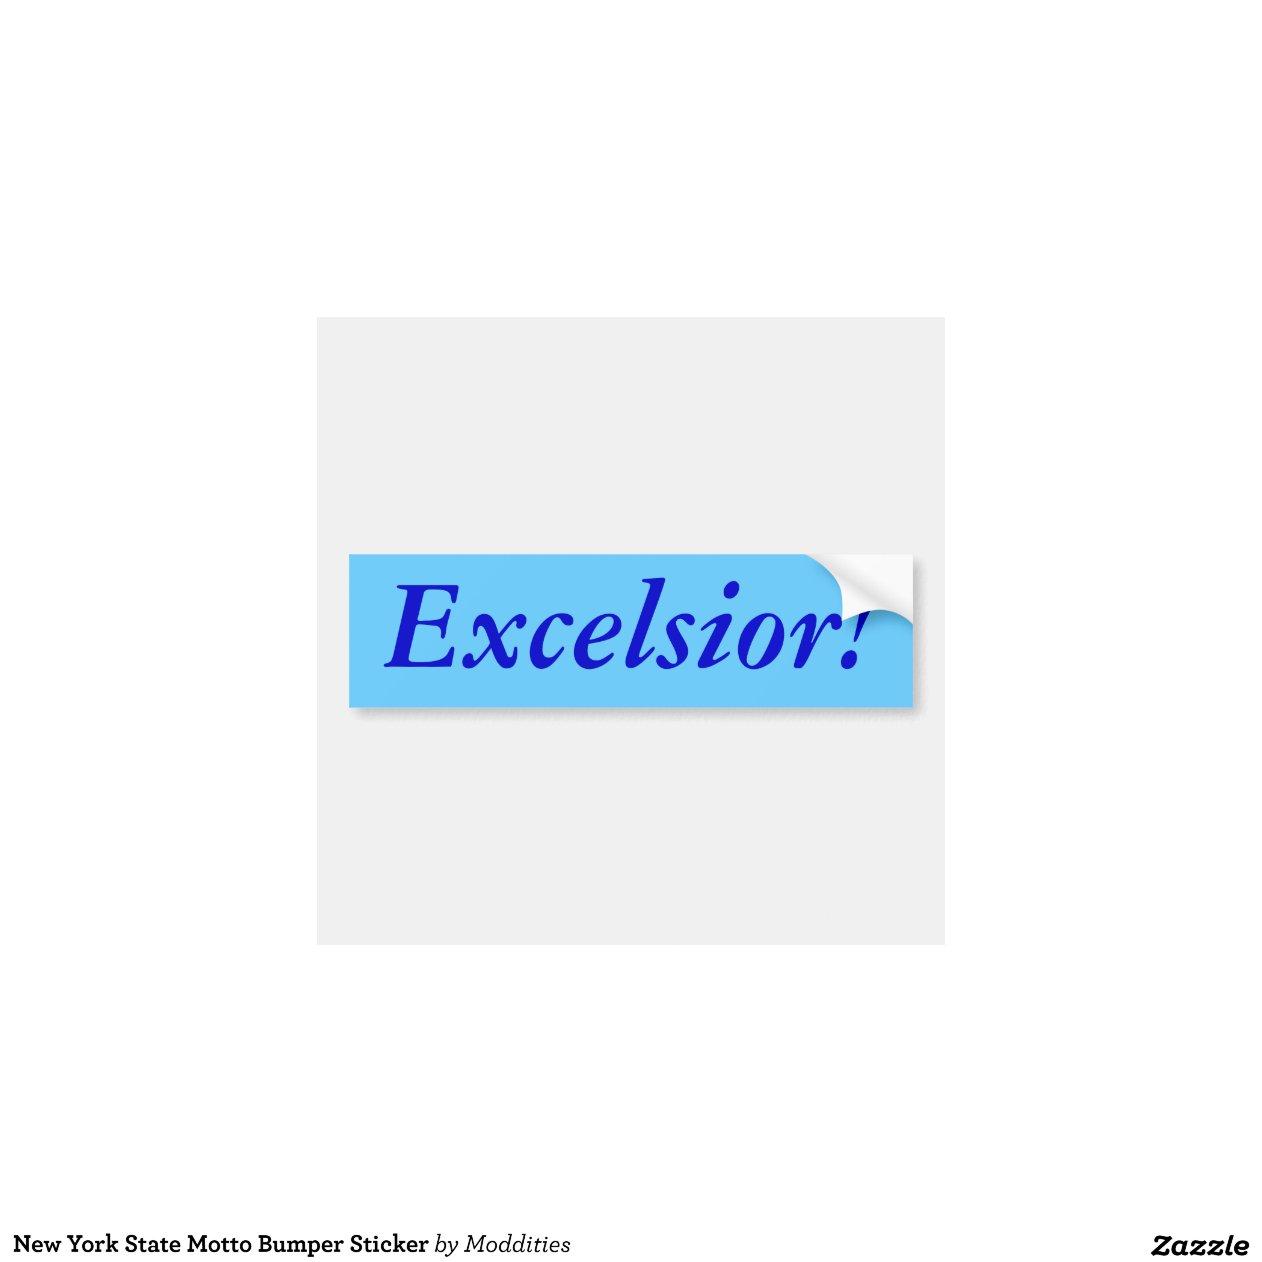 new york state motto bumper sticker car bumper sticker. Black Bedroom Furniture Sets. Home Design Ideas